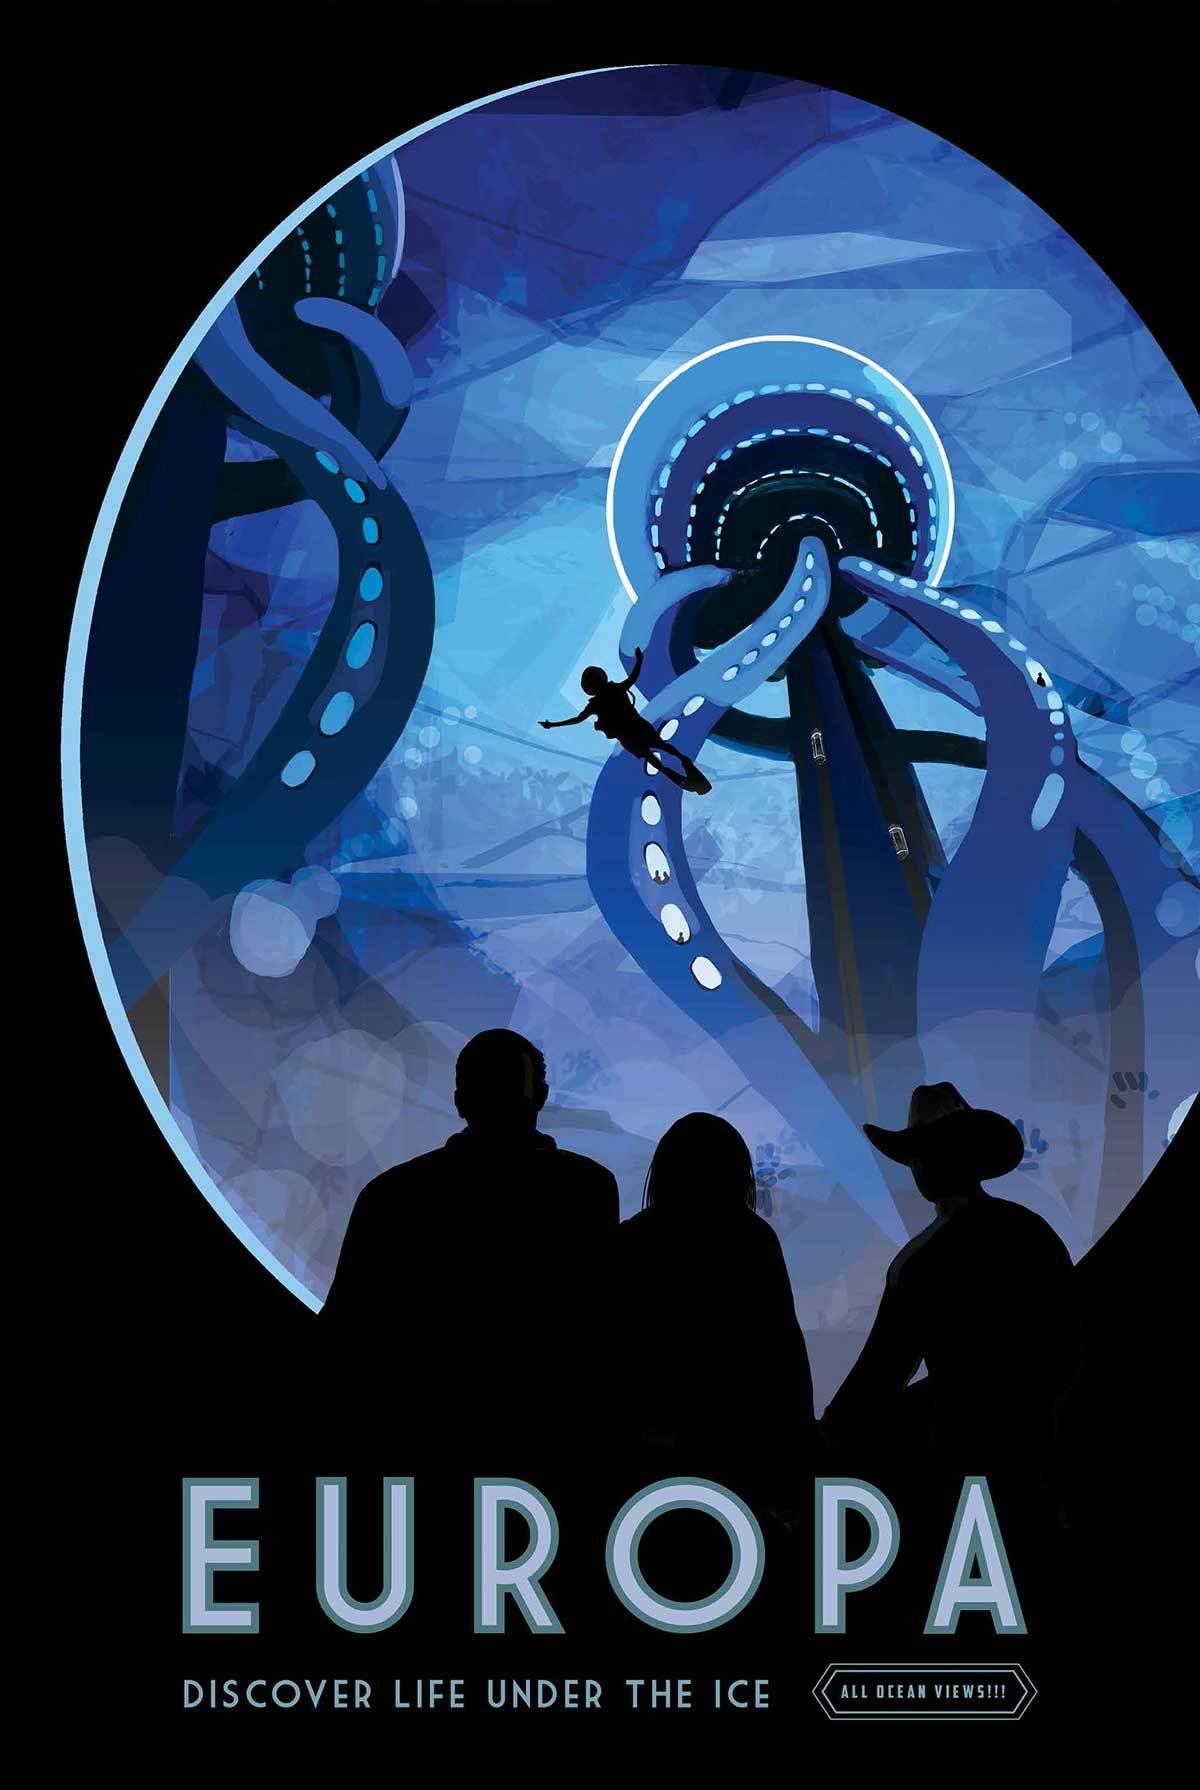 europa poster by NASA